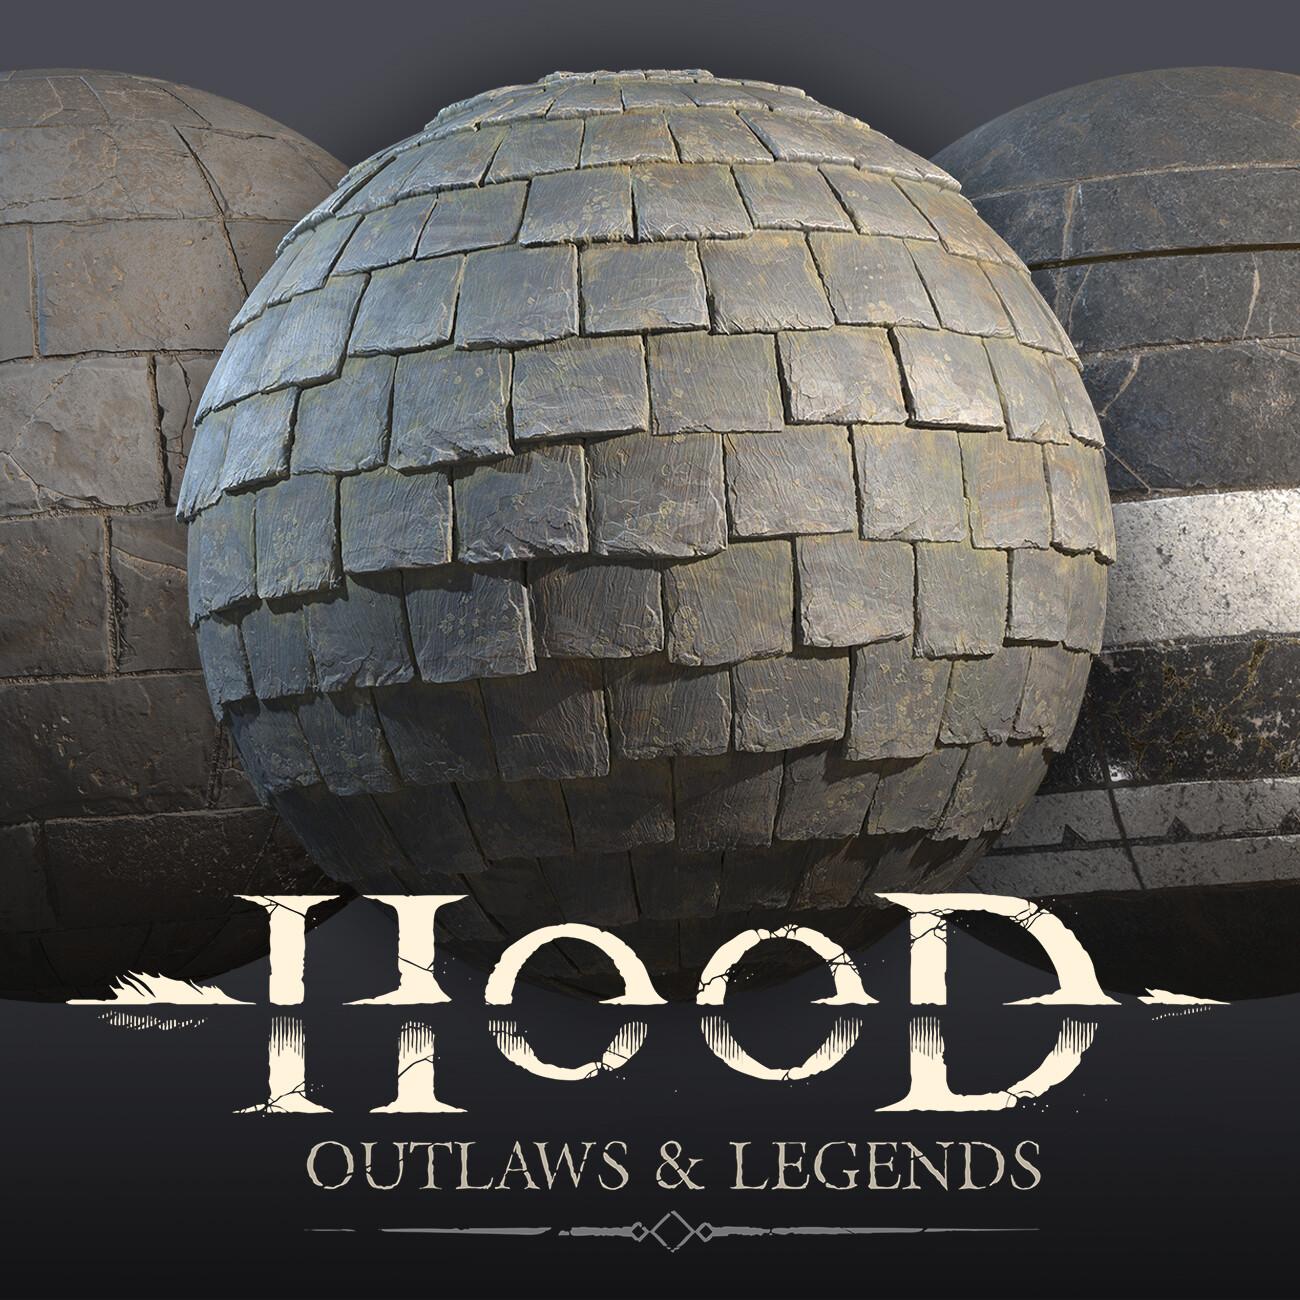 Hood: Outlaws & Legends - Misc Materials